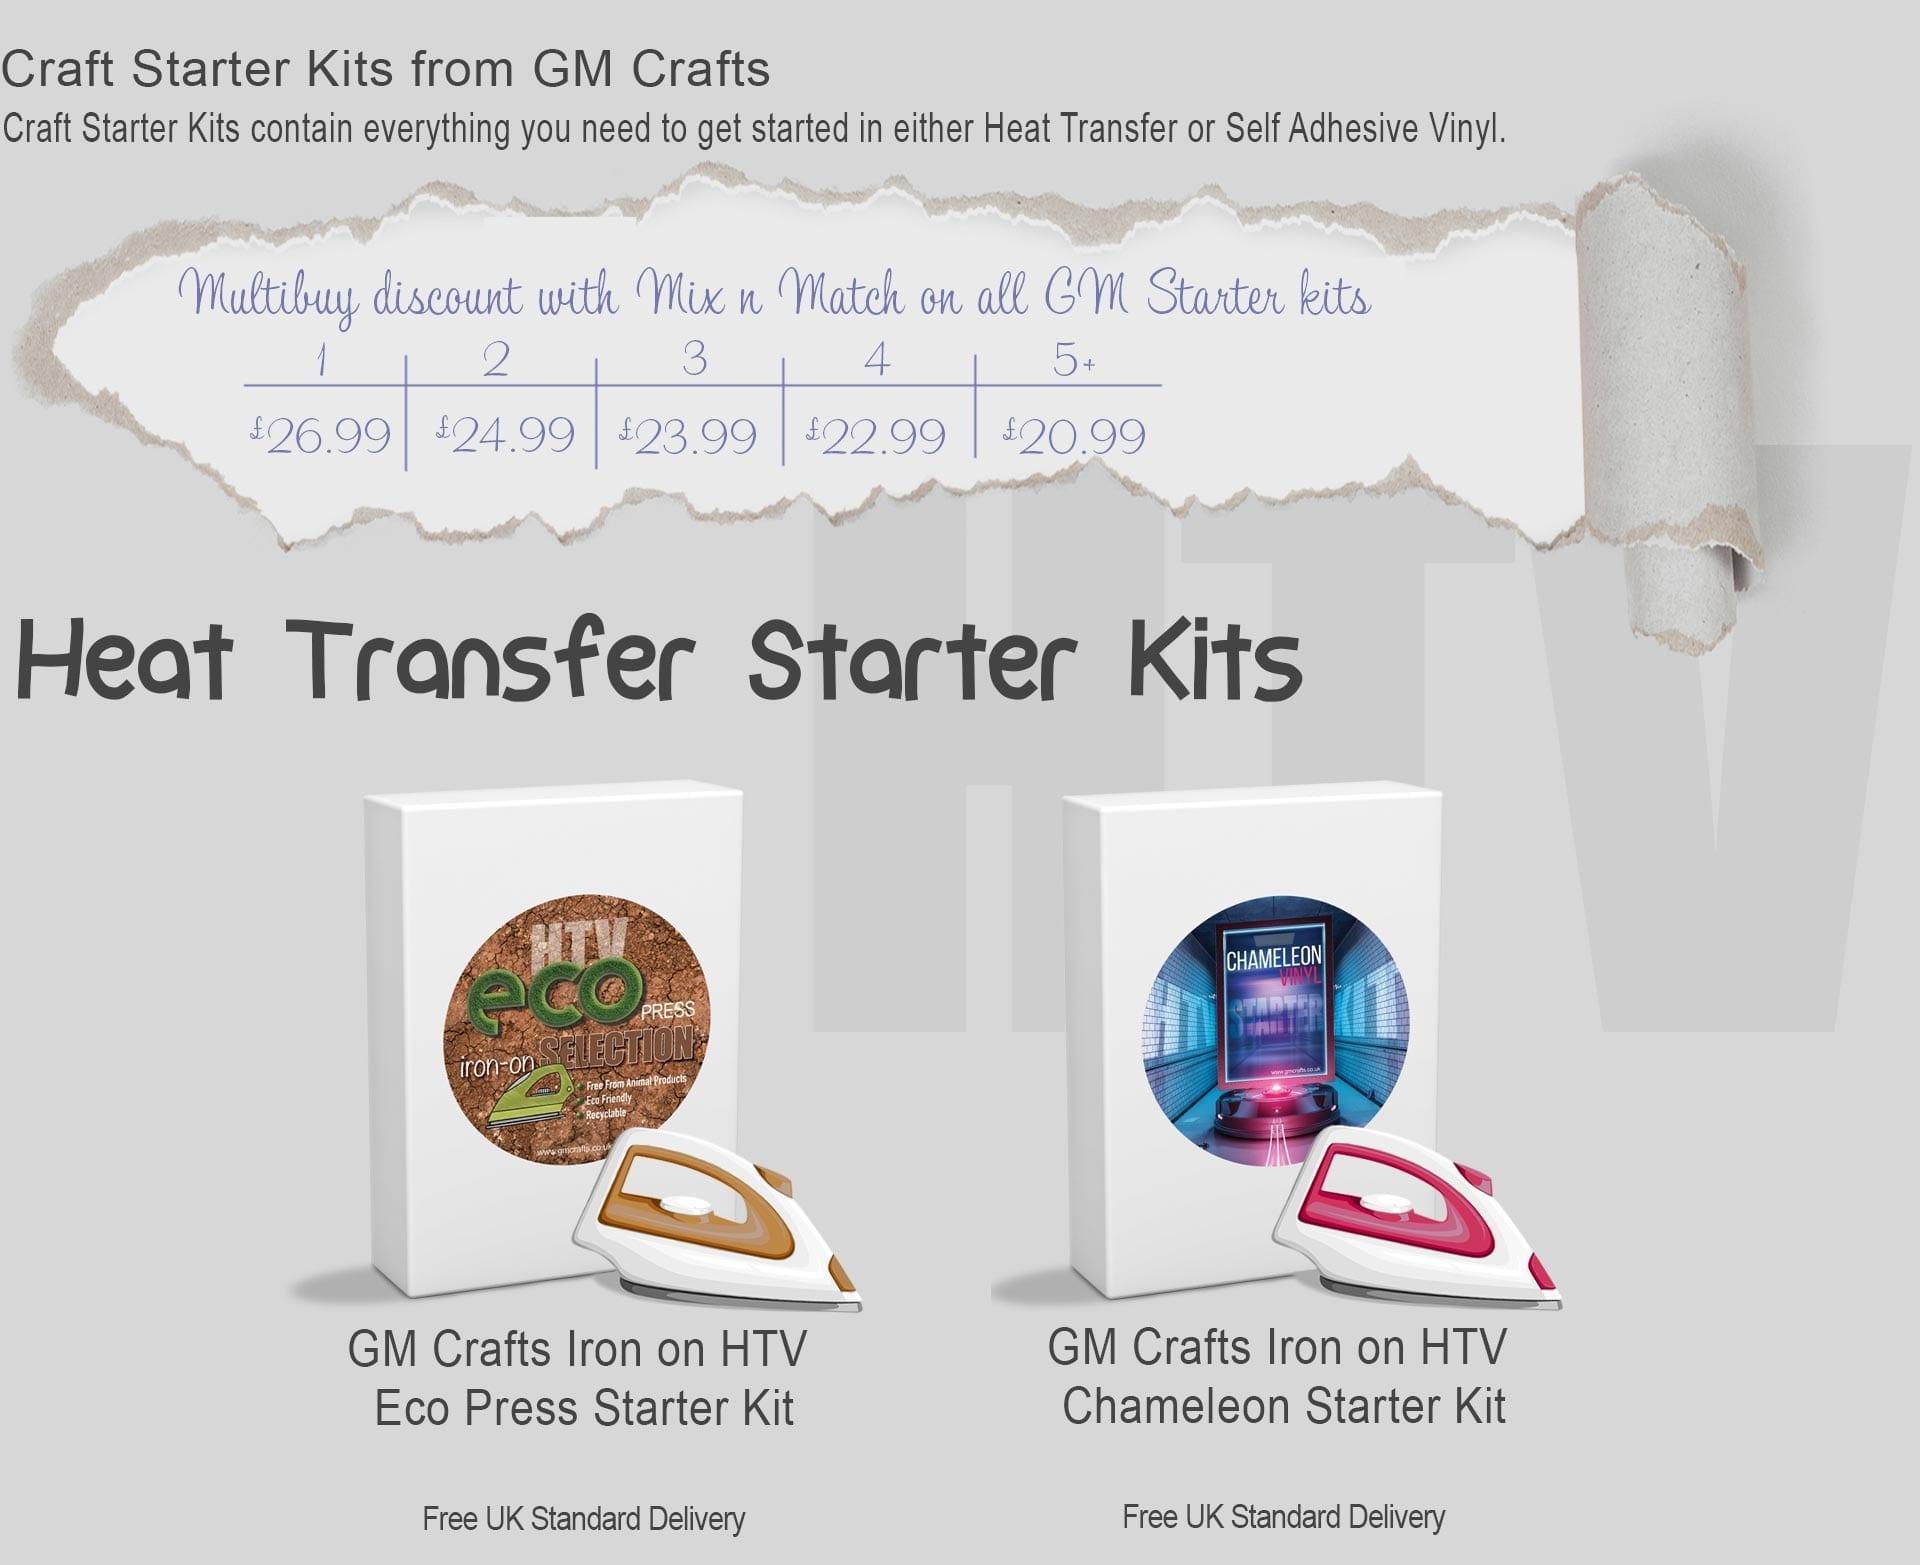 Desktop-Starter-Kits-Page-May-20-1